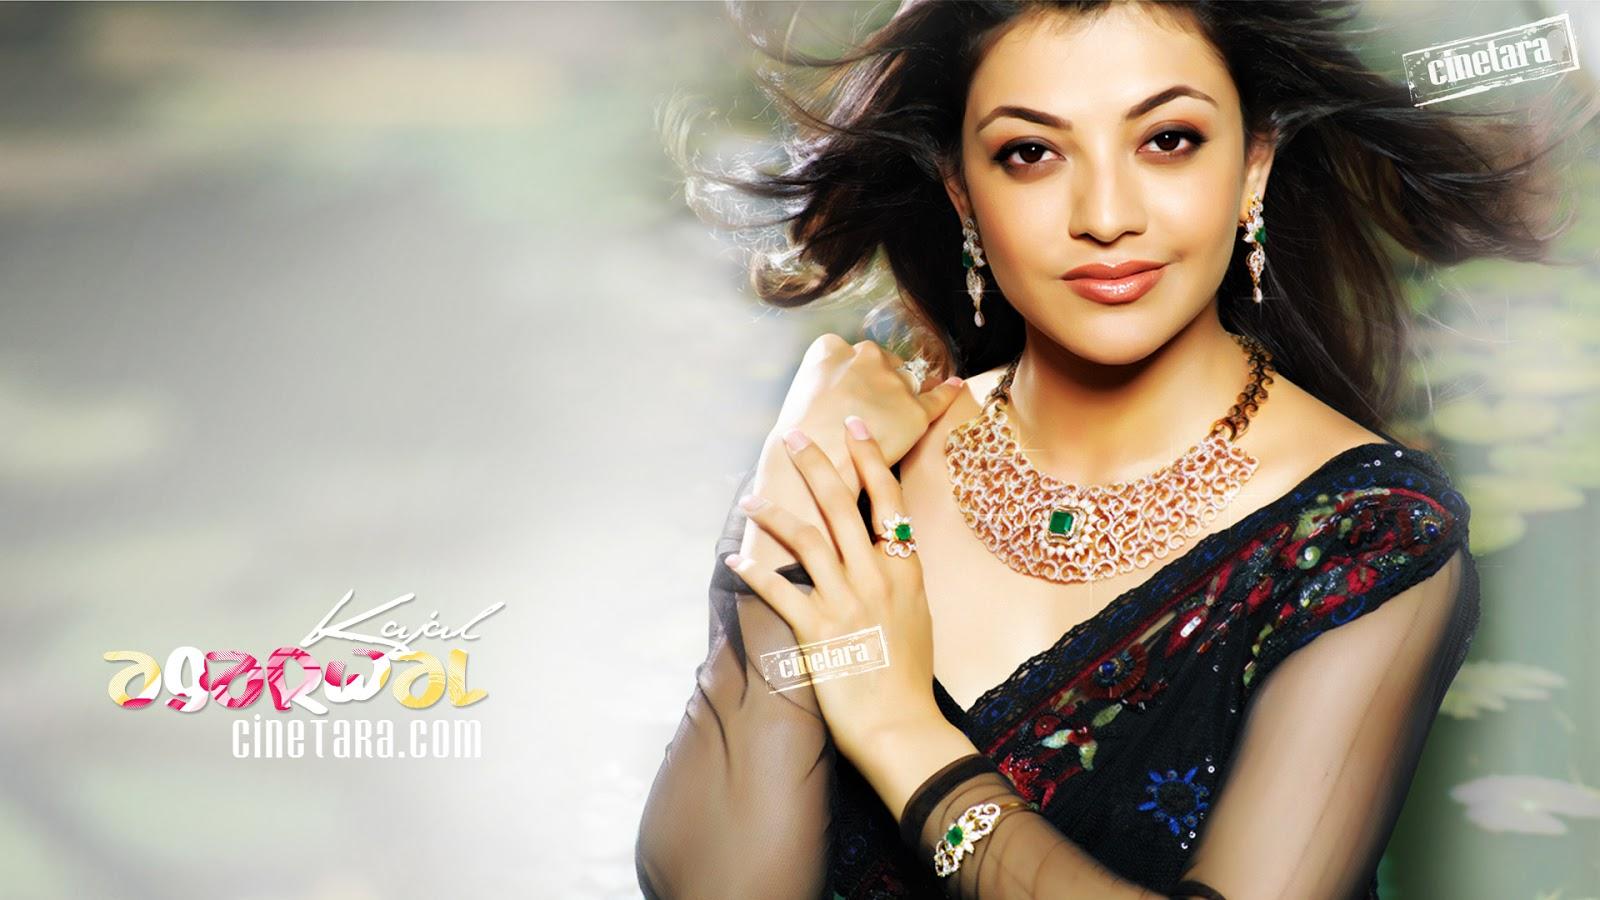 Telugu Actress HQ Desktop Wallpapers